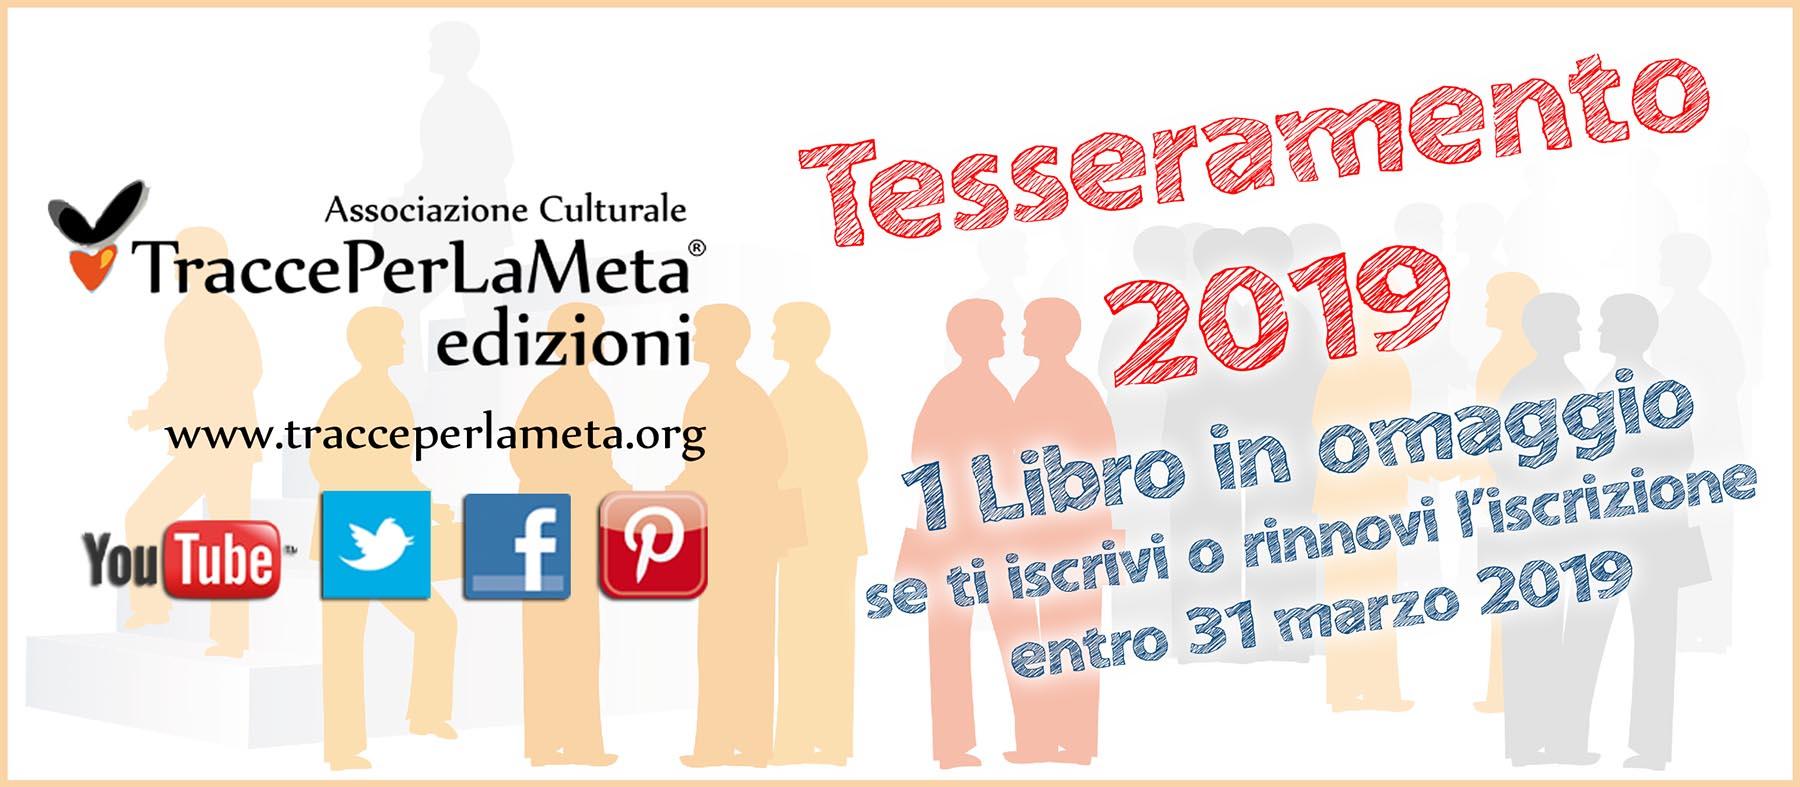 Come Associarsi Tracceperlameta Edizioni Associazione Culturale